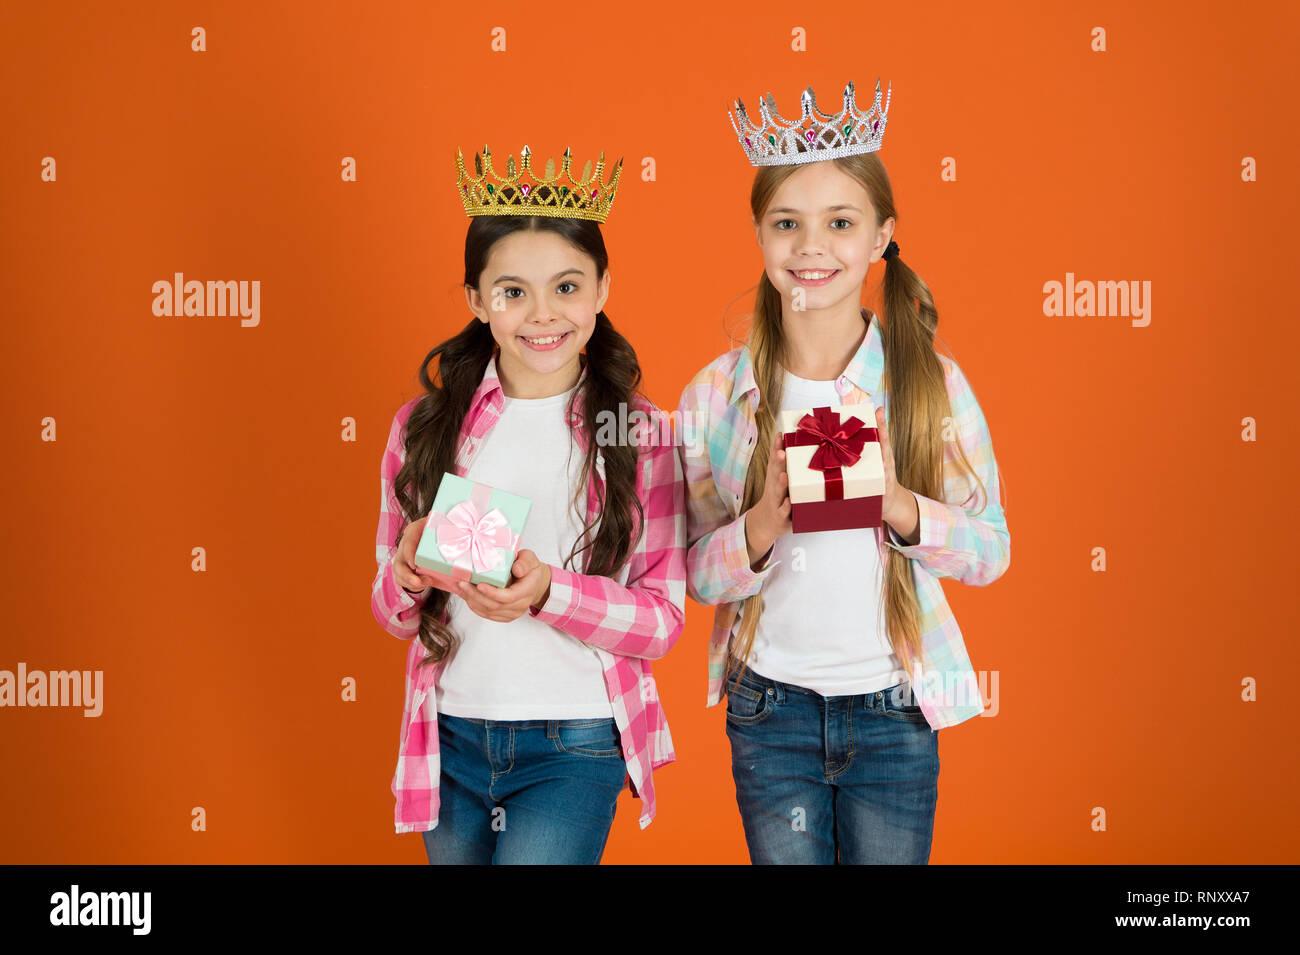 Egocentric princess. Kids wear golden crowns symbol princess. Every girl dreaming become princess. Little princess. Happy childhood. We deserve only best. Girls wear crowns. Spoiled children concept. - Stock Image